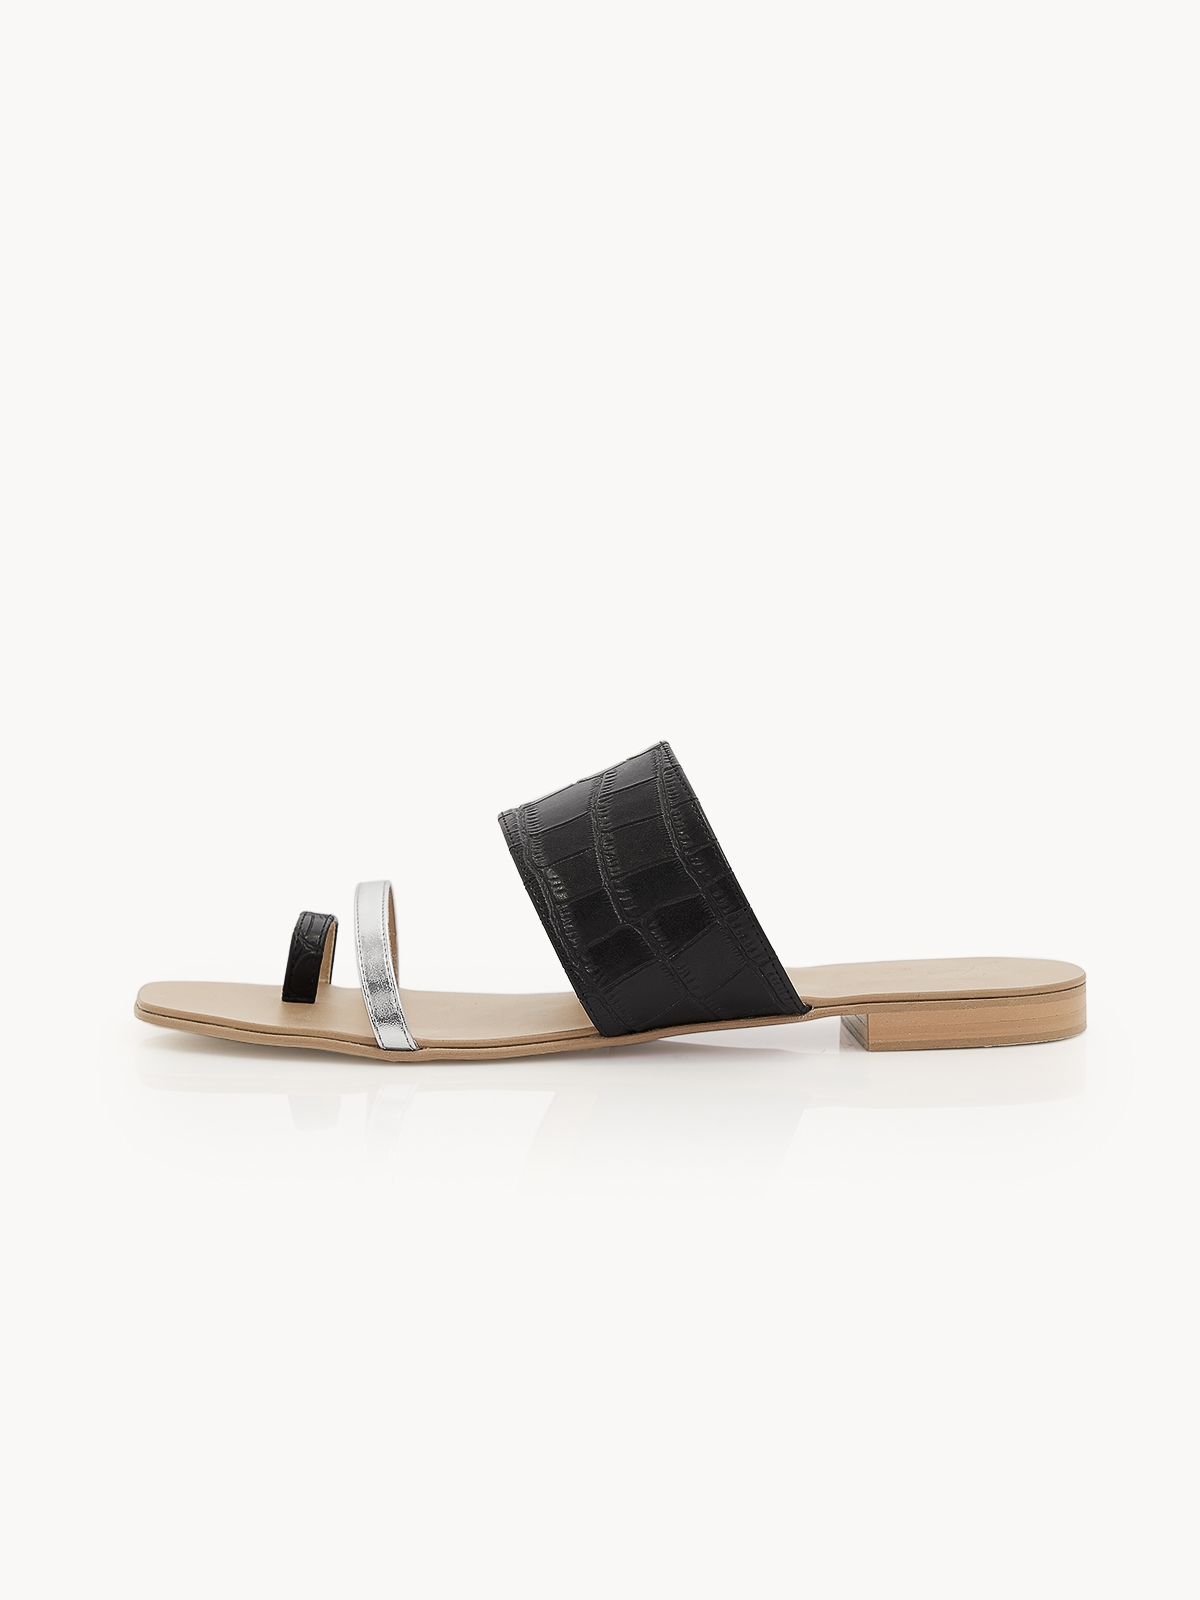 Prove Toe Ring Sandals Black